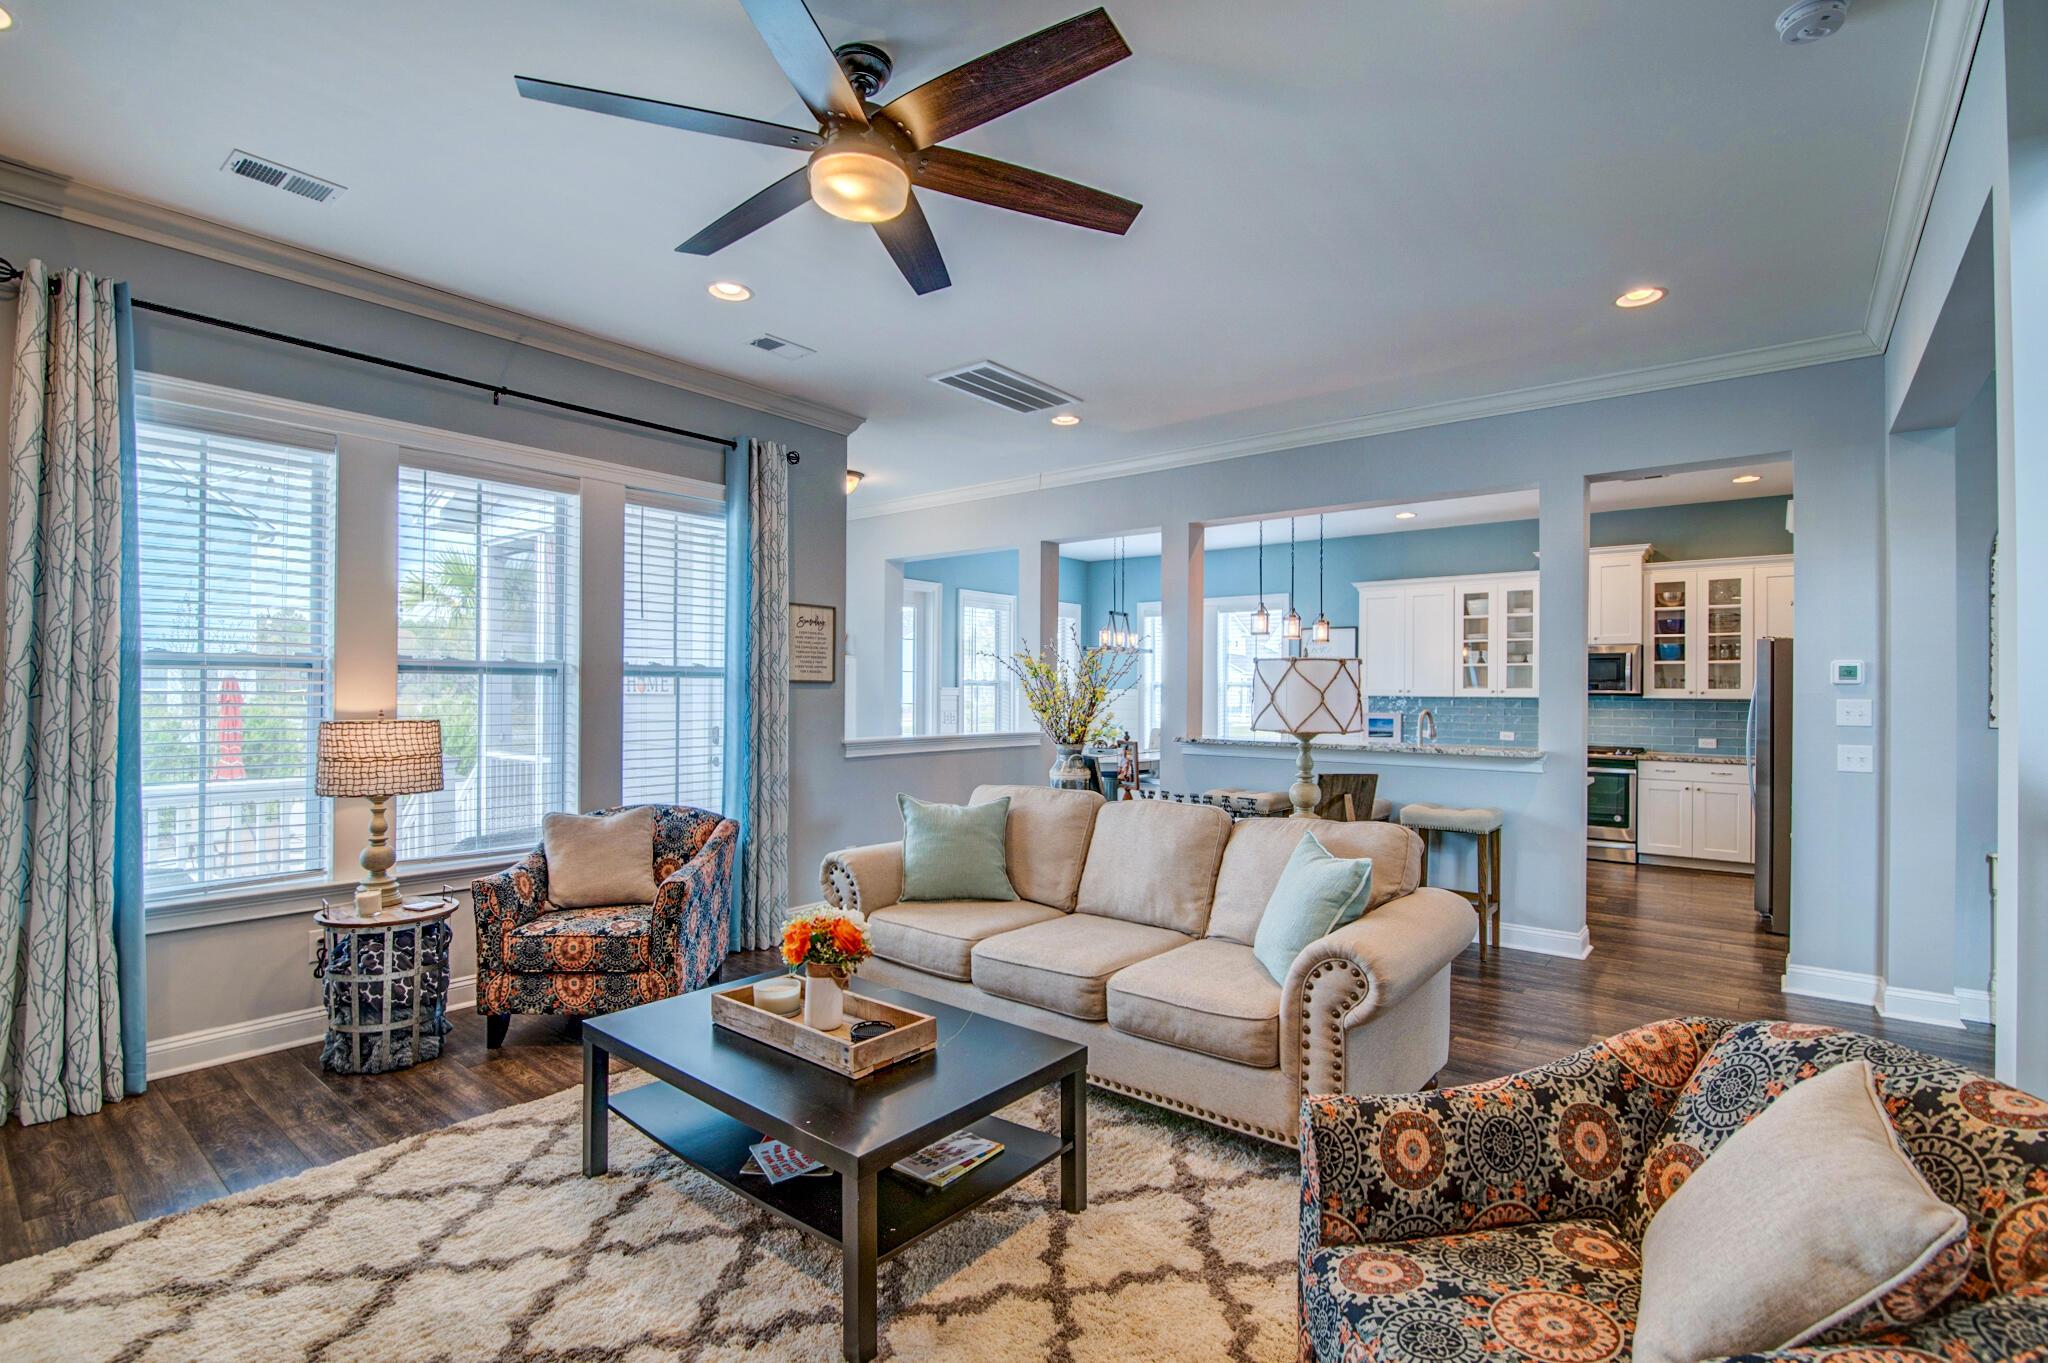 Carolina Park Homes For Sale - 3634 Spindrift, Mount Pleasant, SC - 21